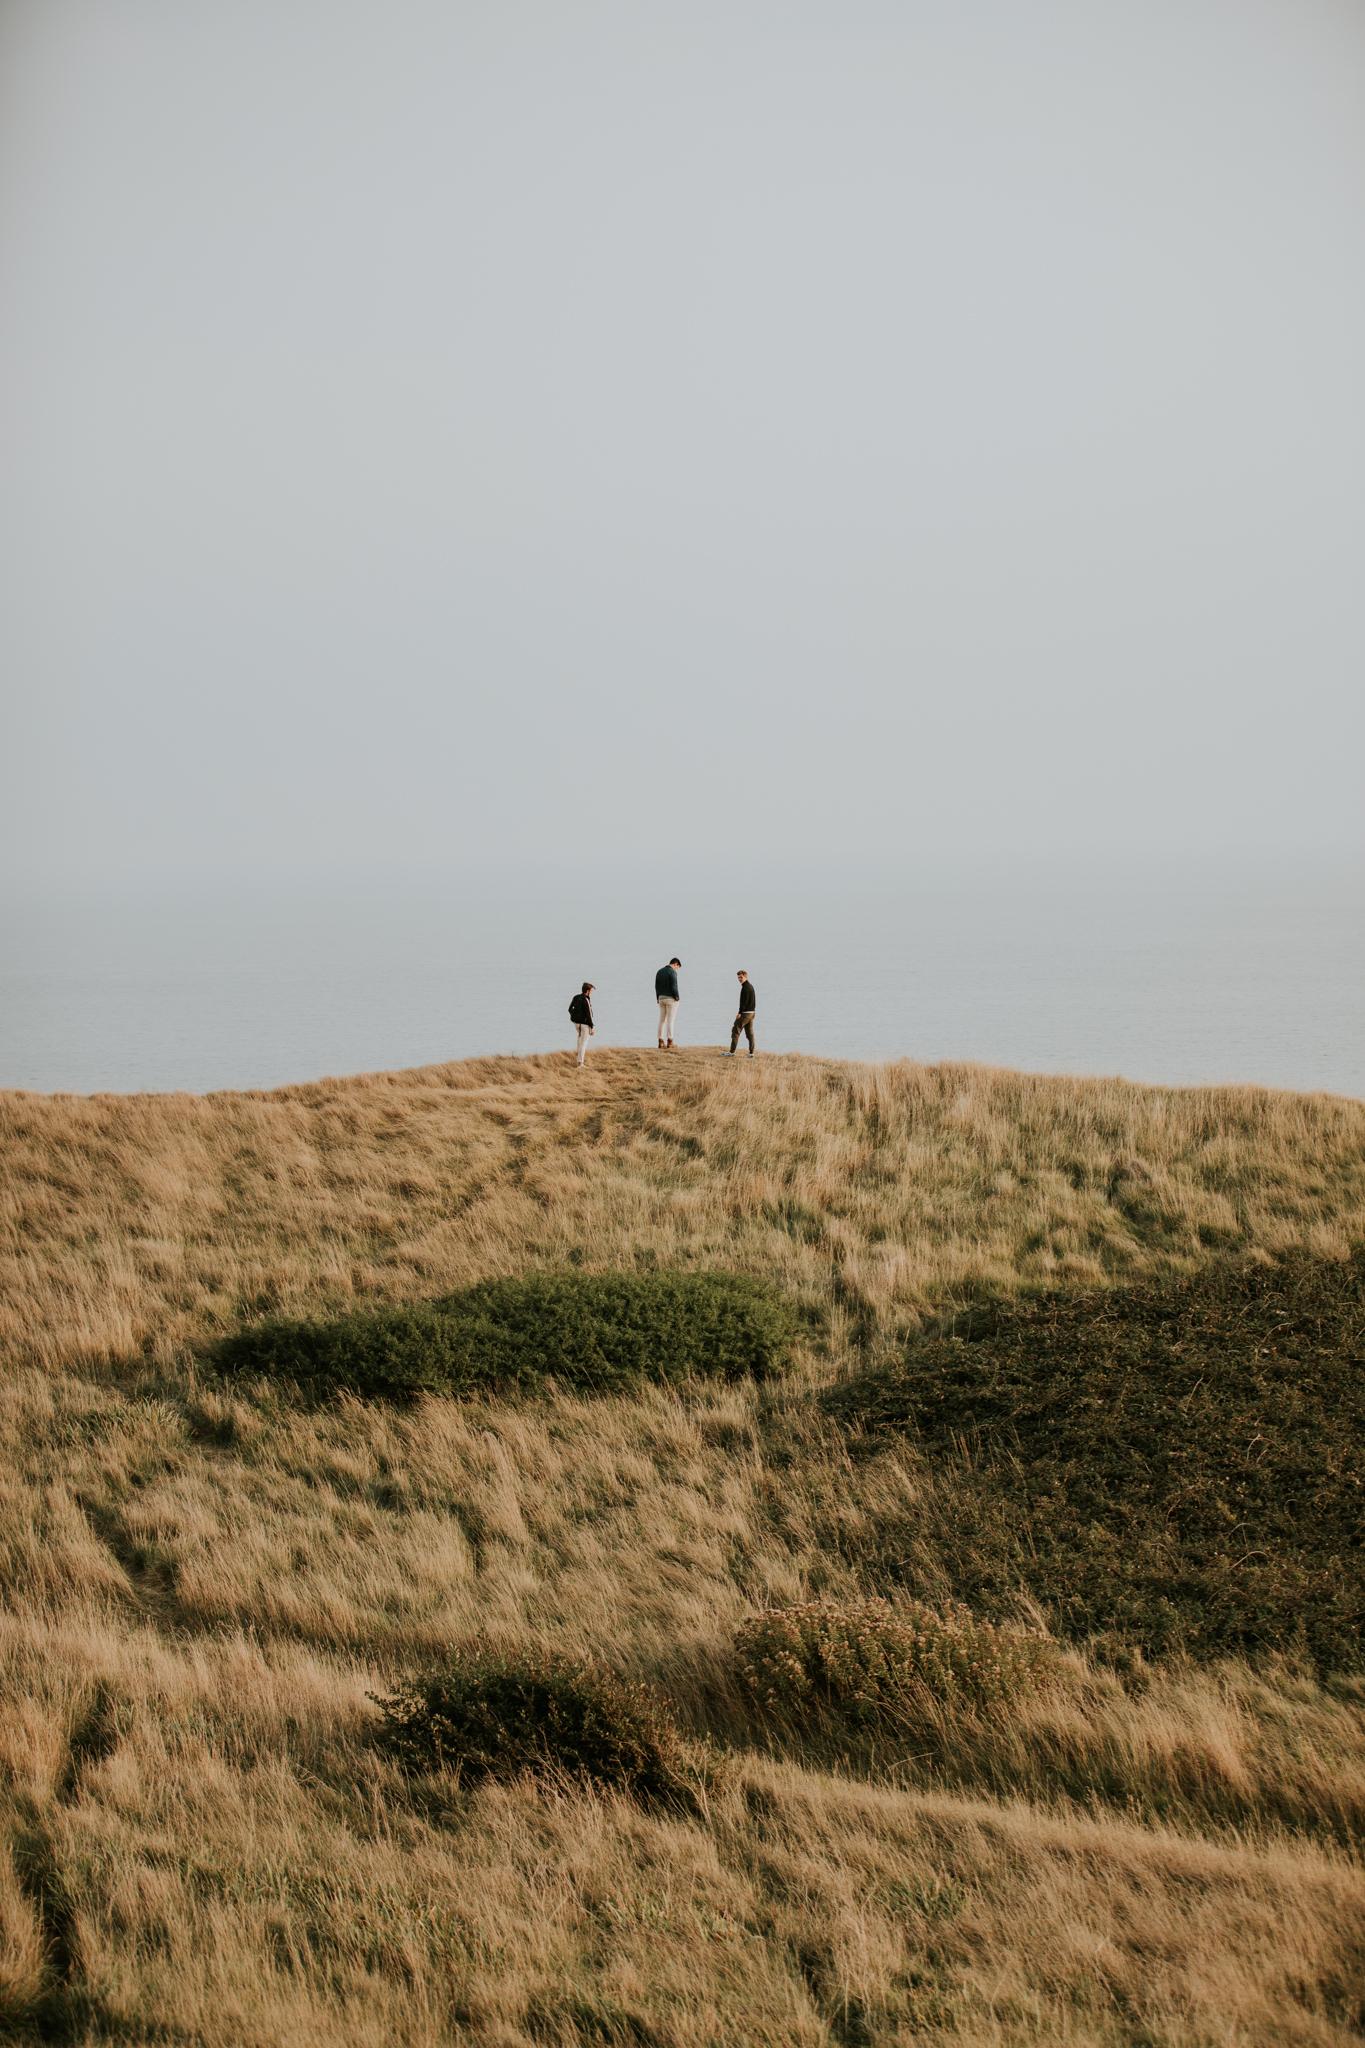 Natalie Skoric - England Travel Photography (135).jpg